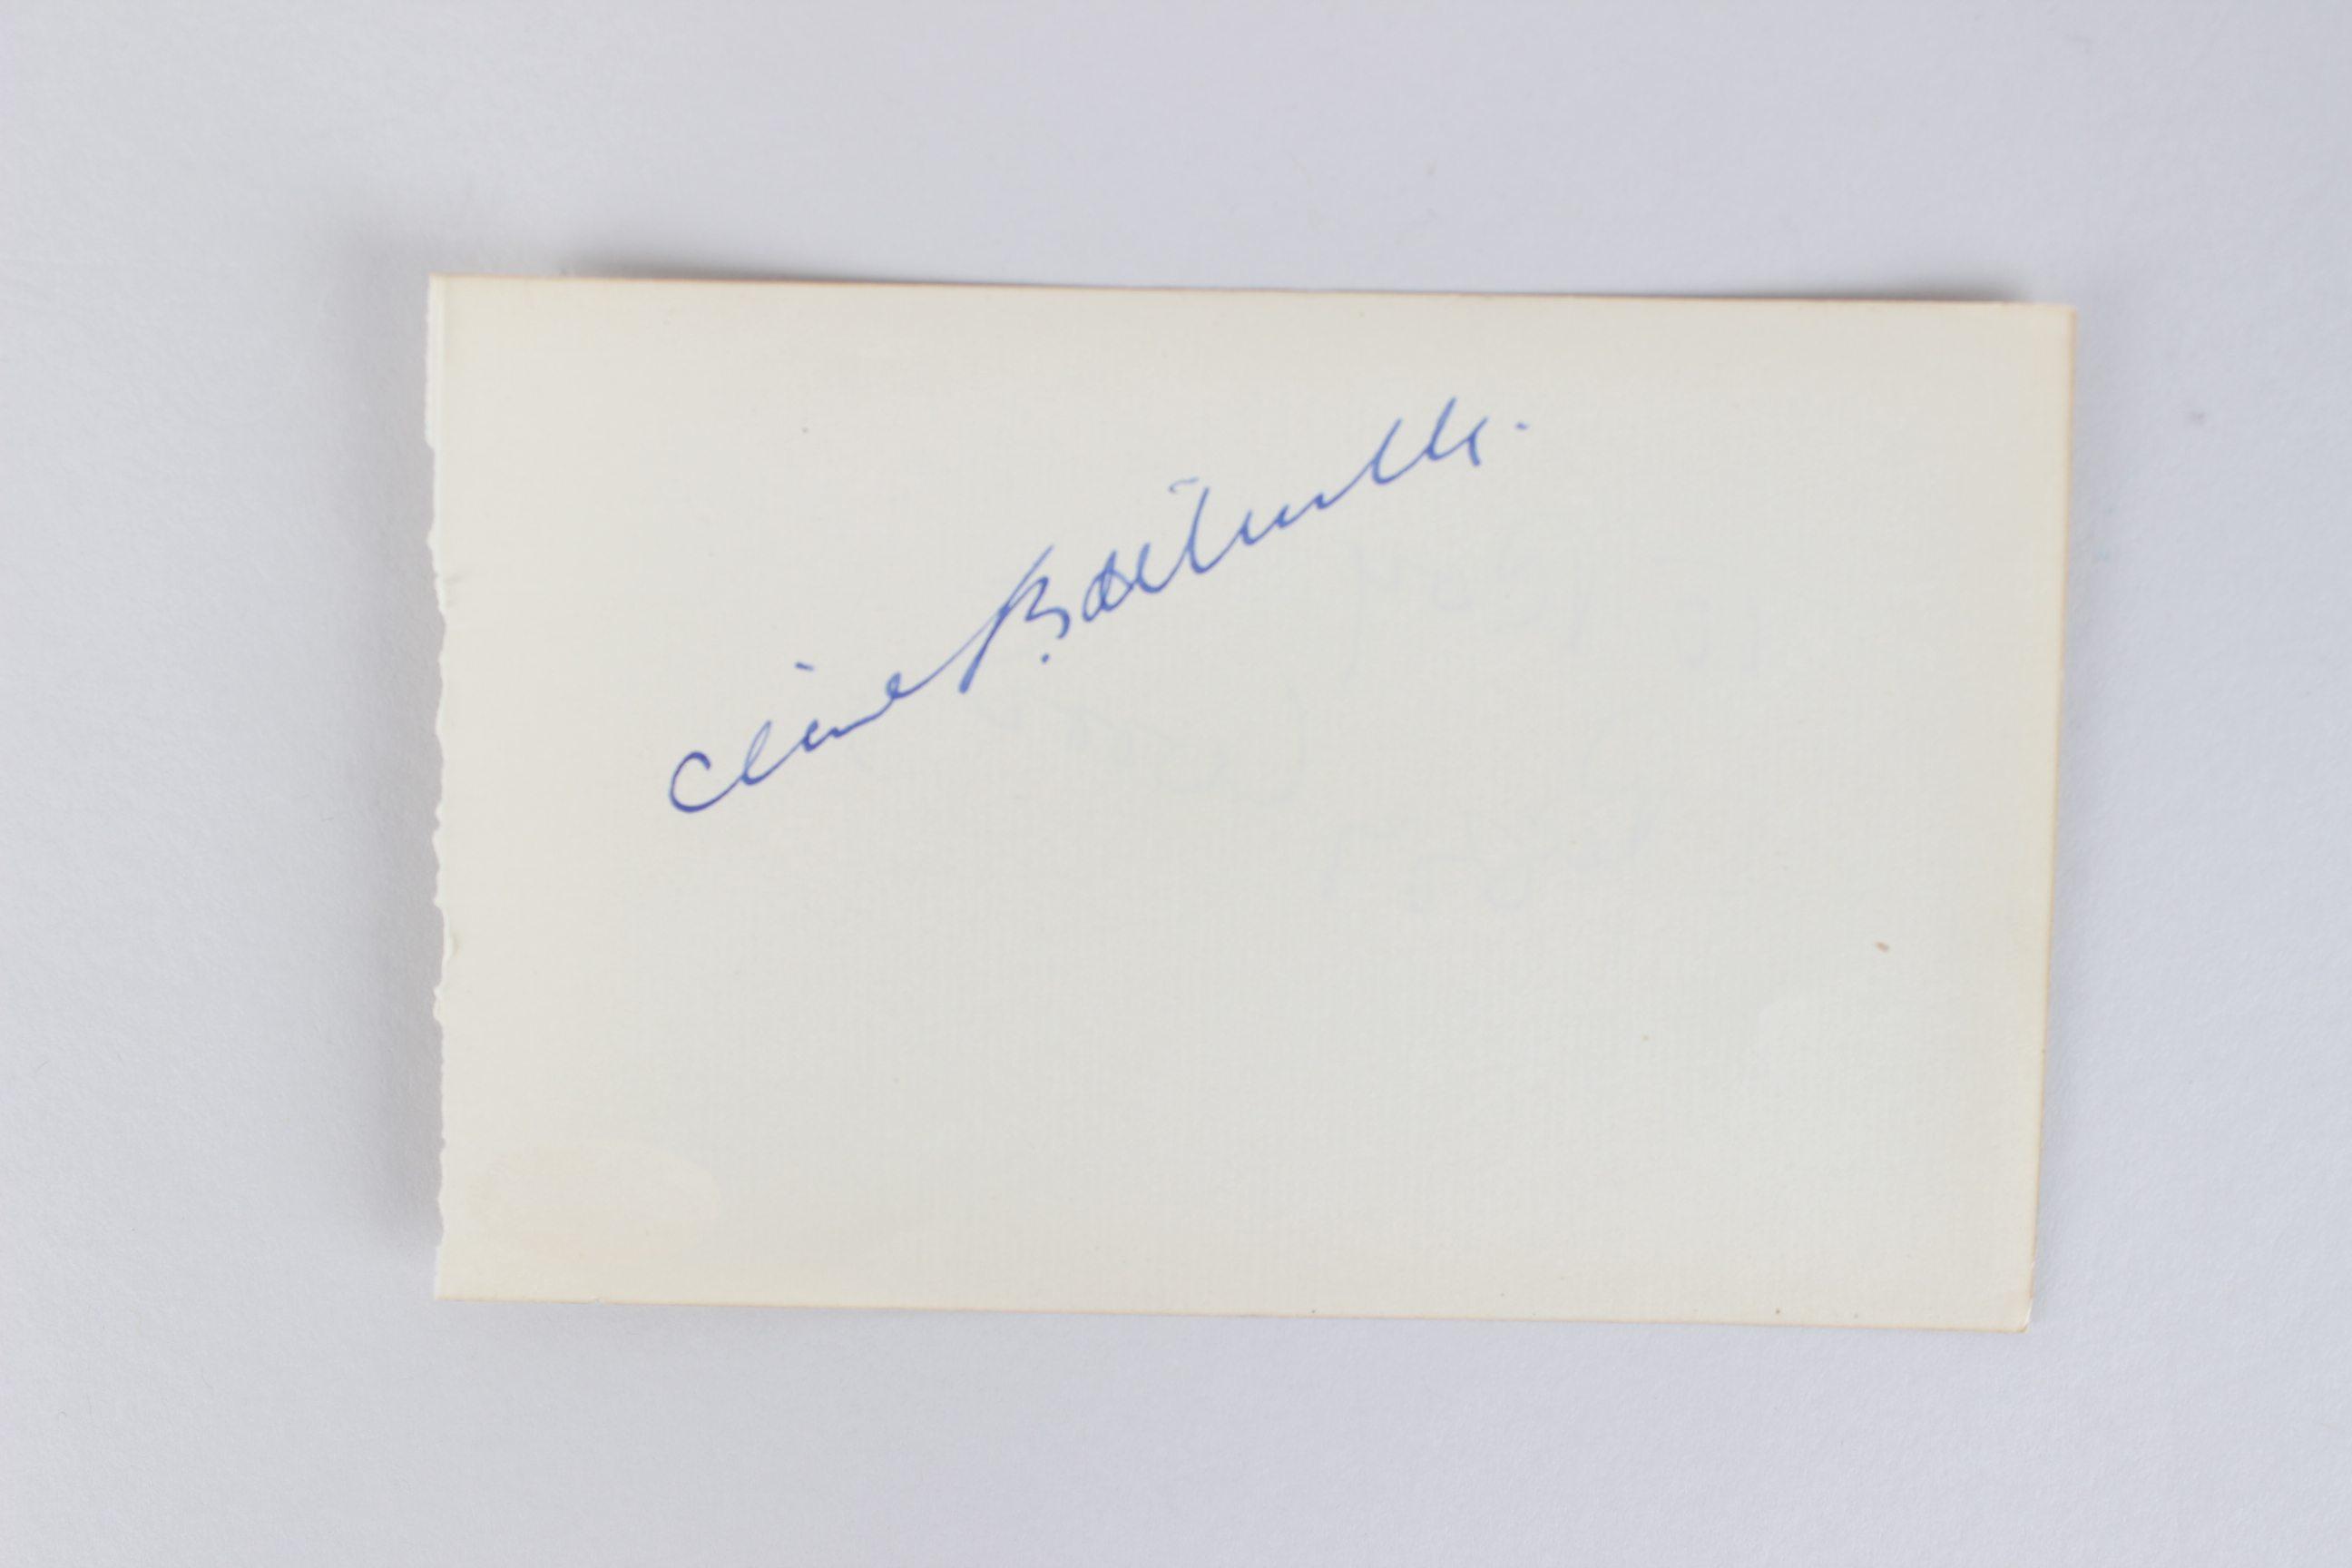 Cecil B. DeMille & Peggy Wood Signed 4x6 Cut (JSA)